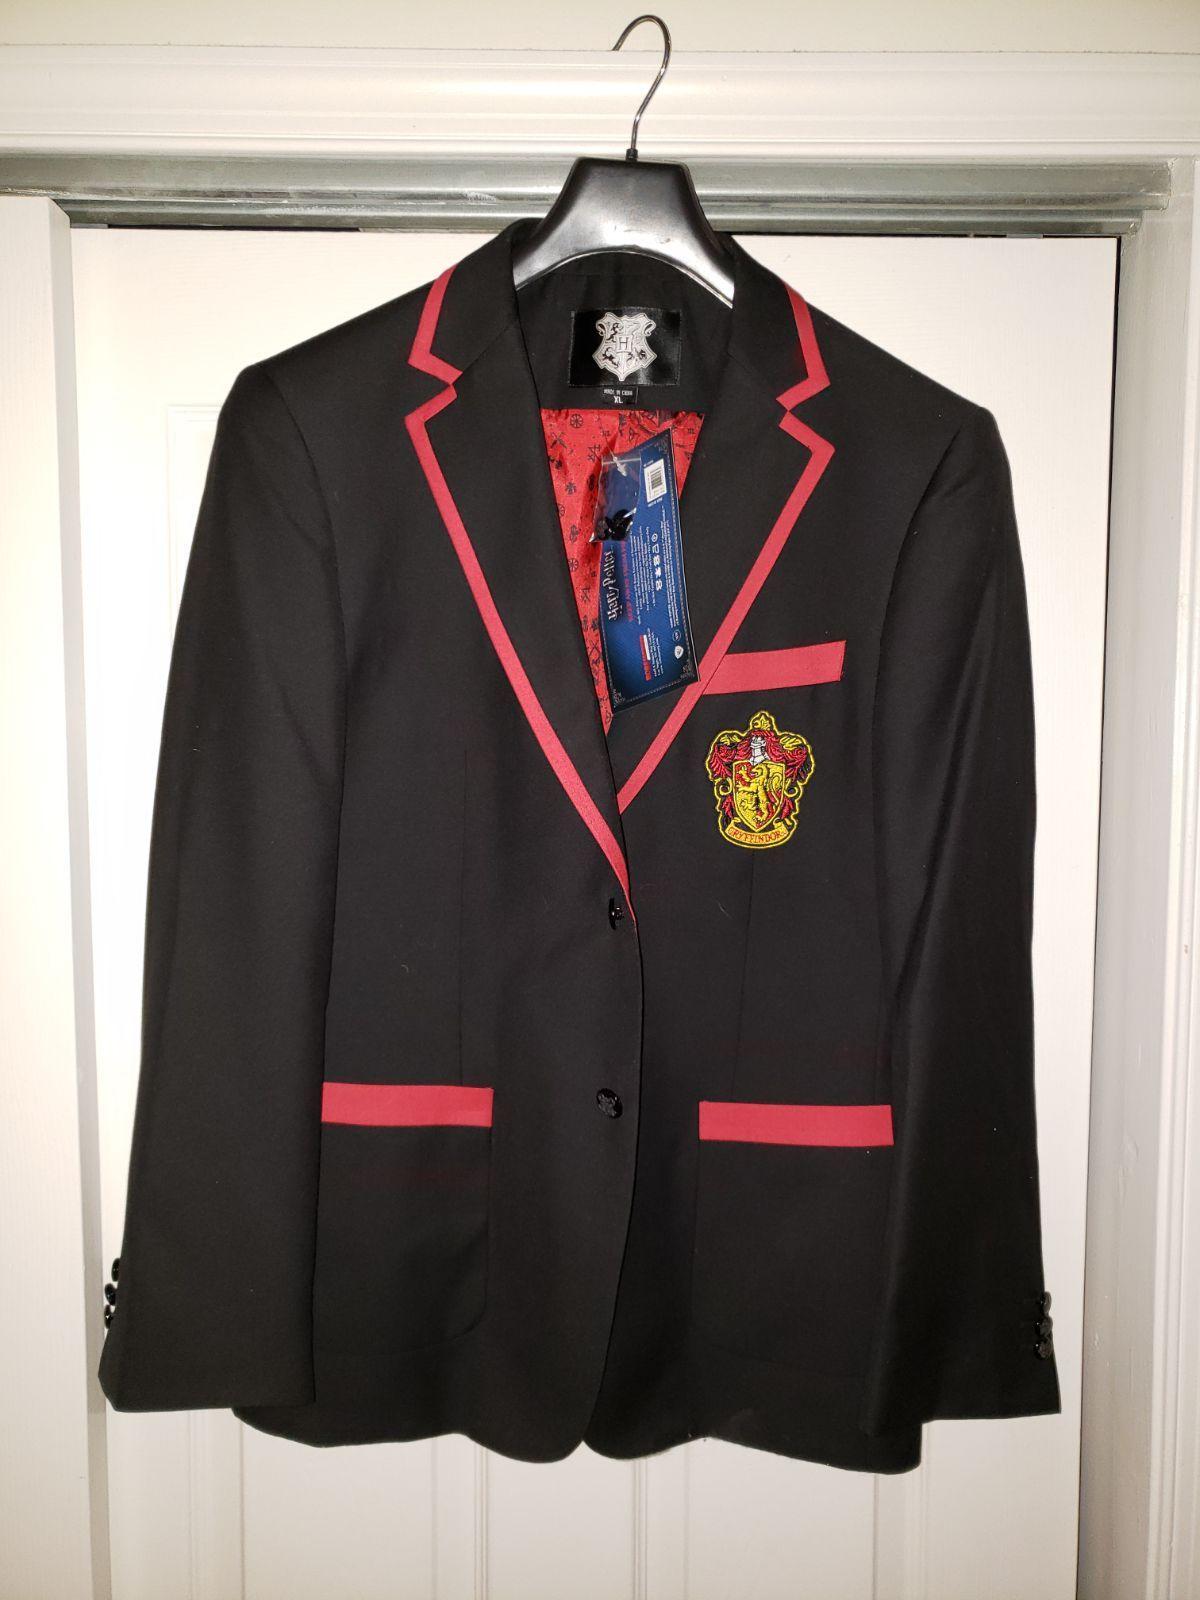 XLHarry Potter Griffyndor Blazer Blazer, Jacket